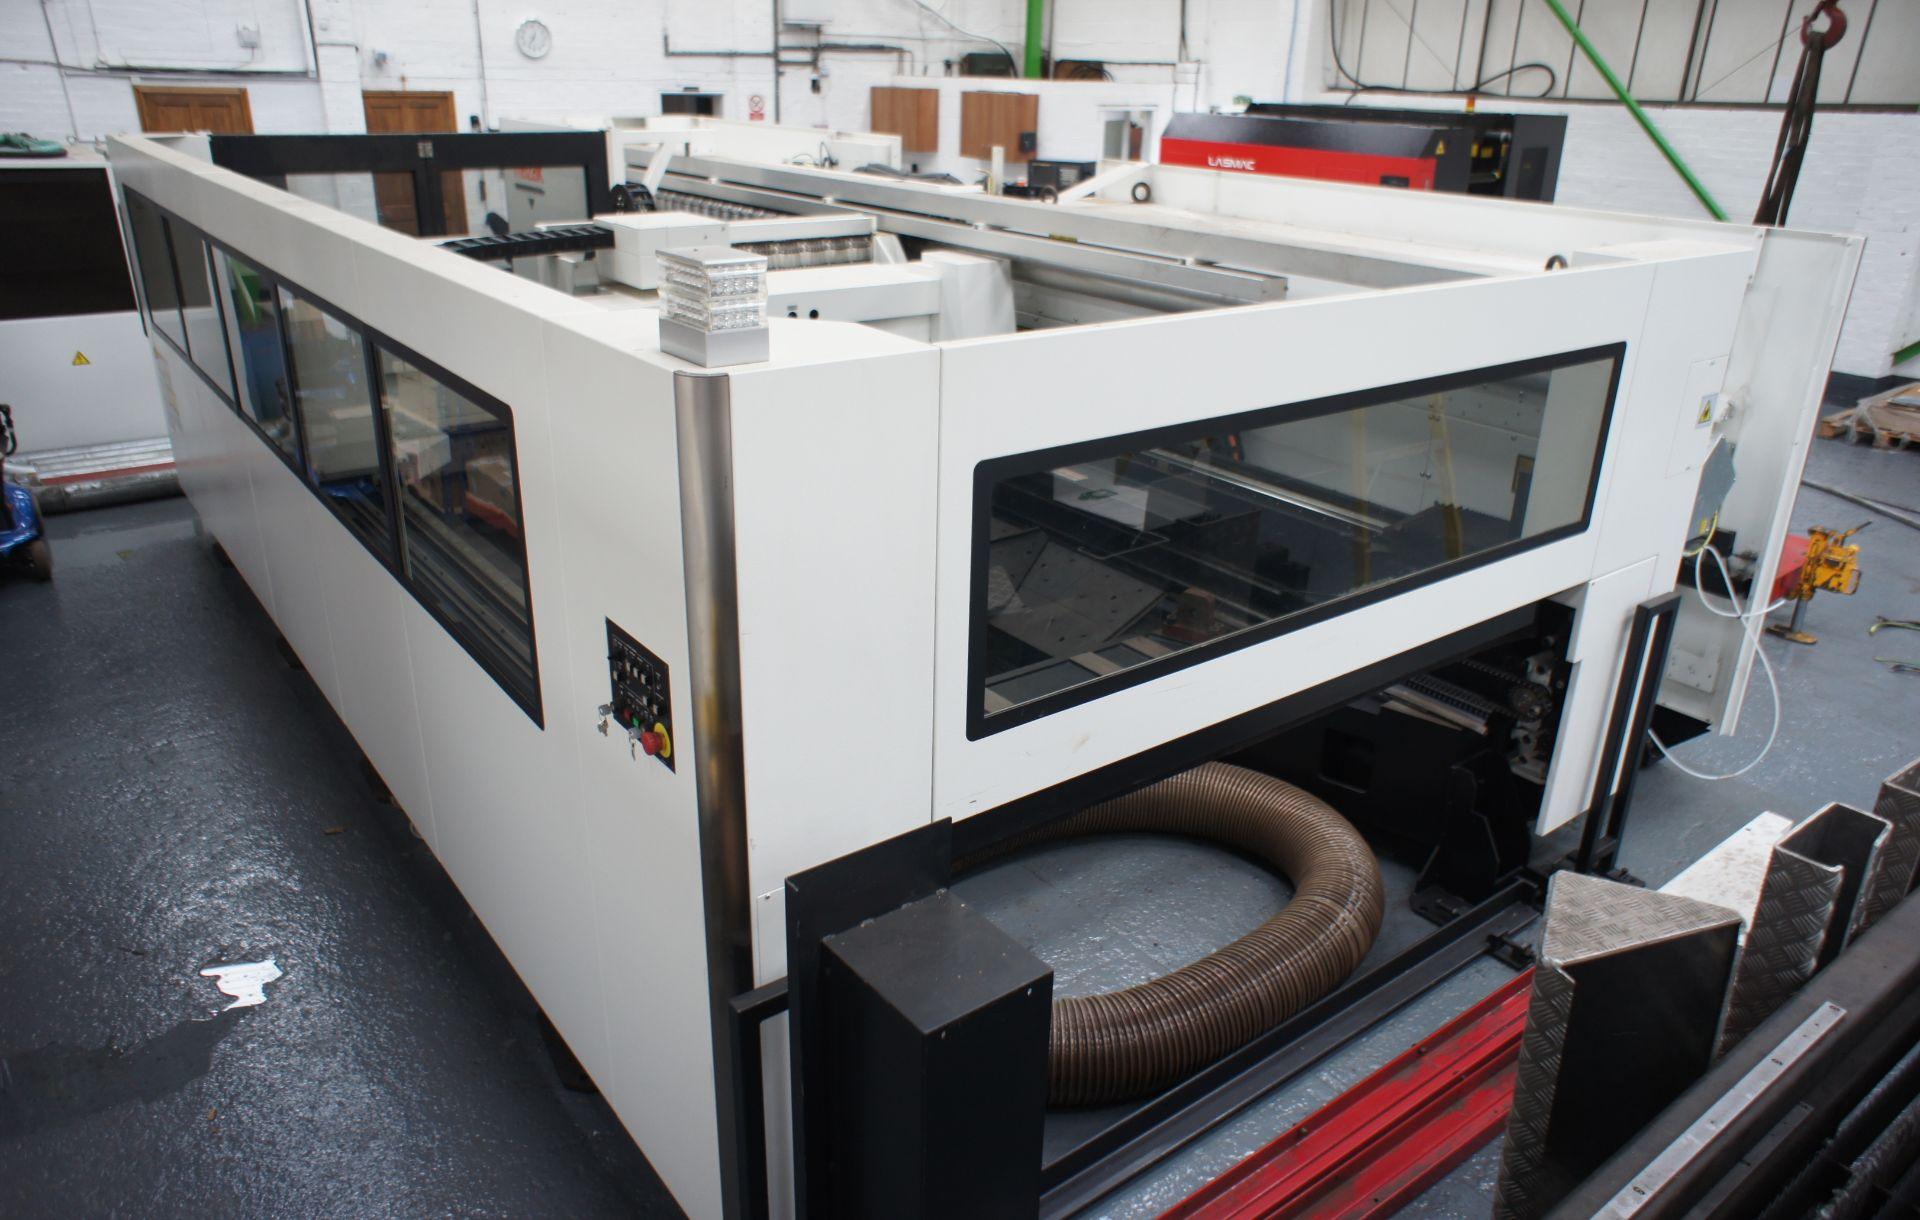 2015 - Mazak OptiPlex 4020 II Laser Cutting Machin - Image 6 of 15